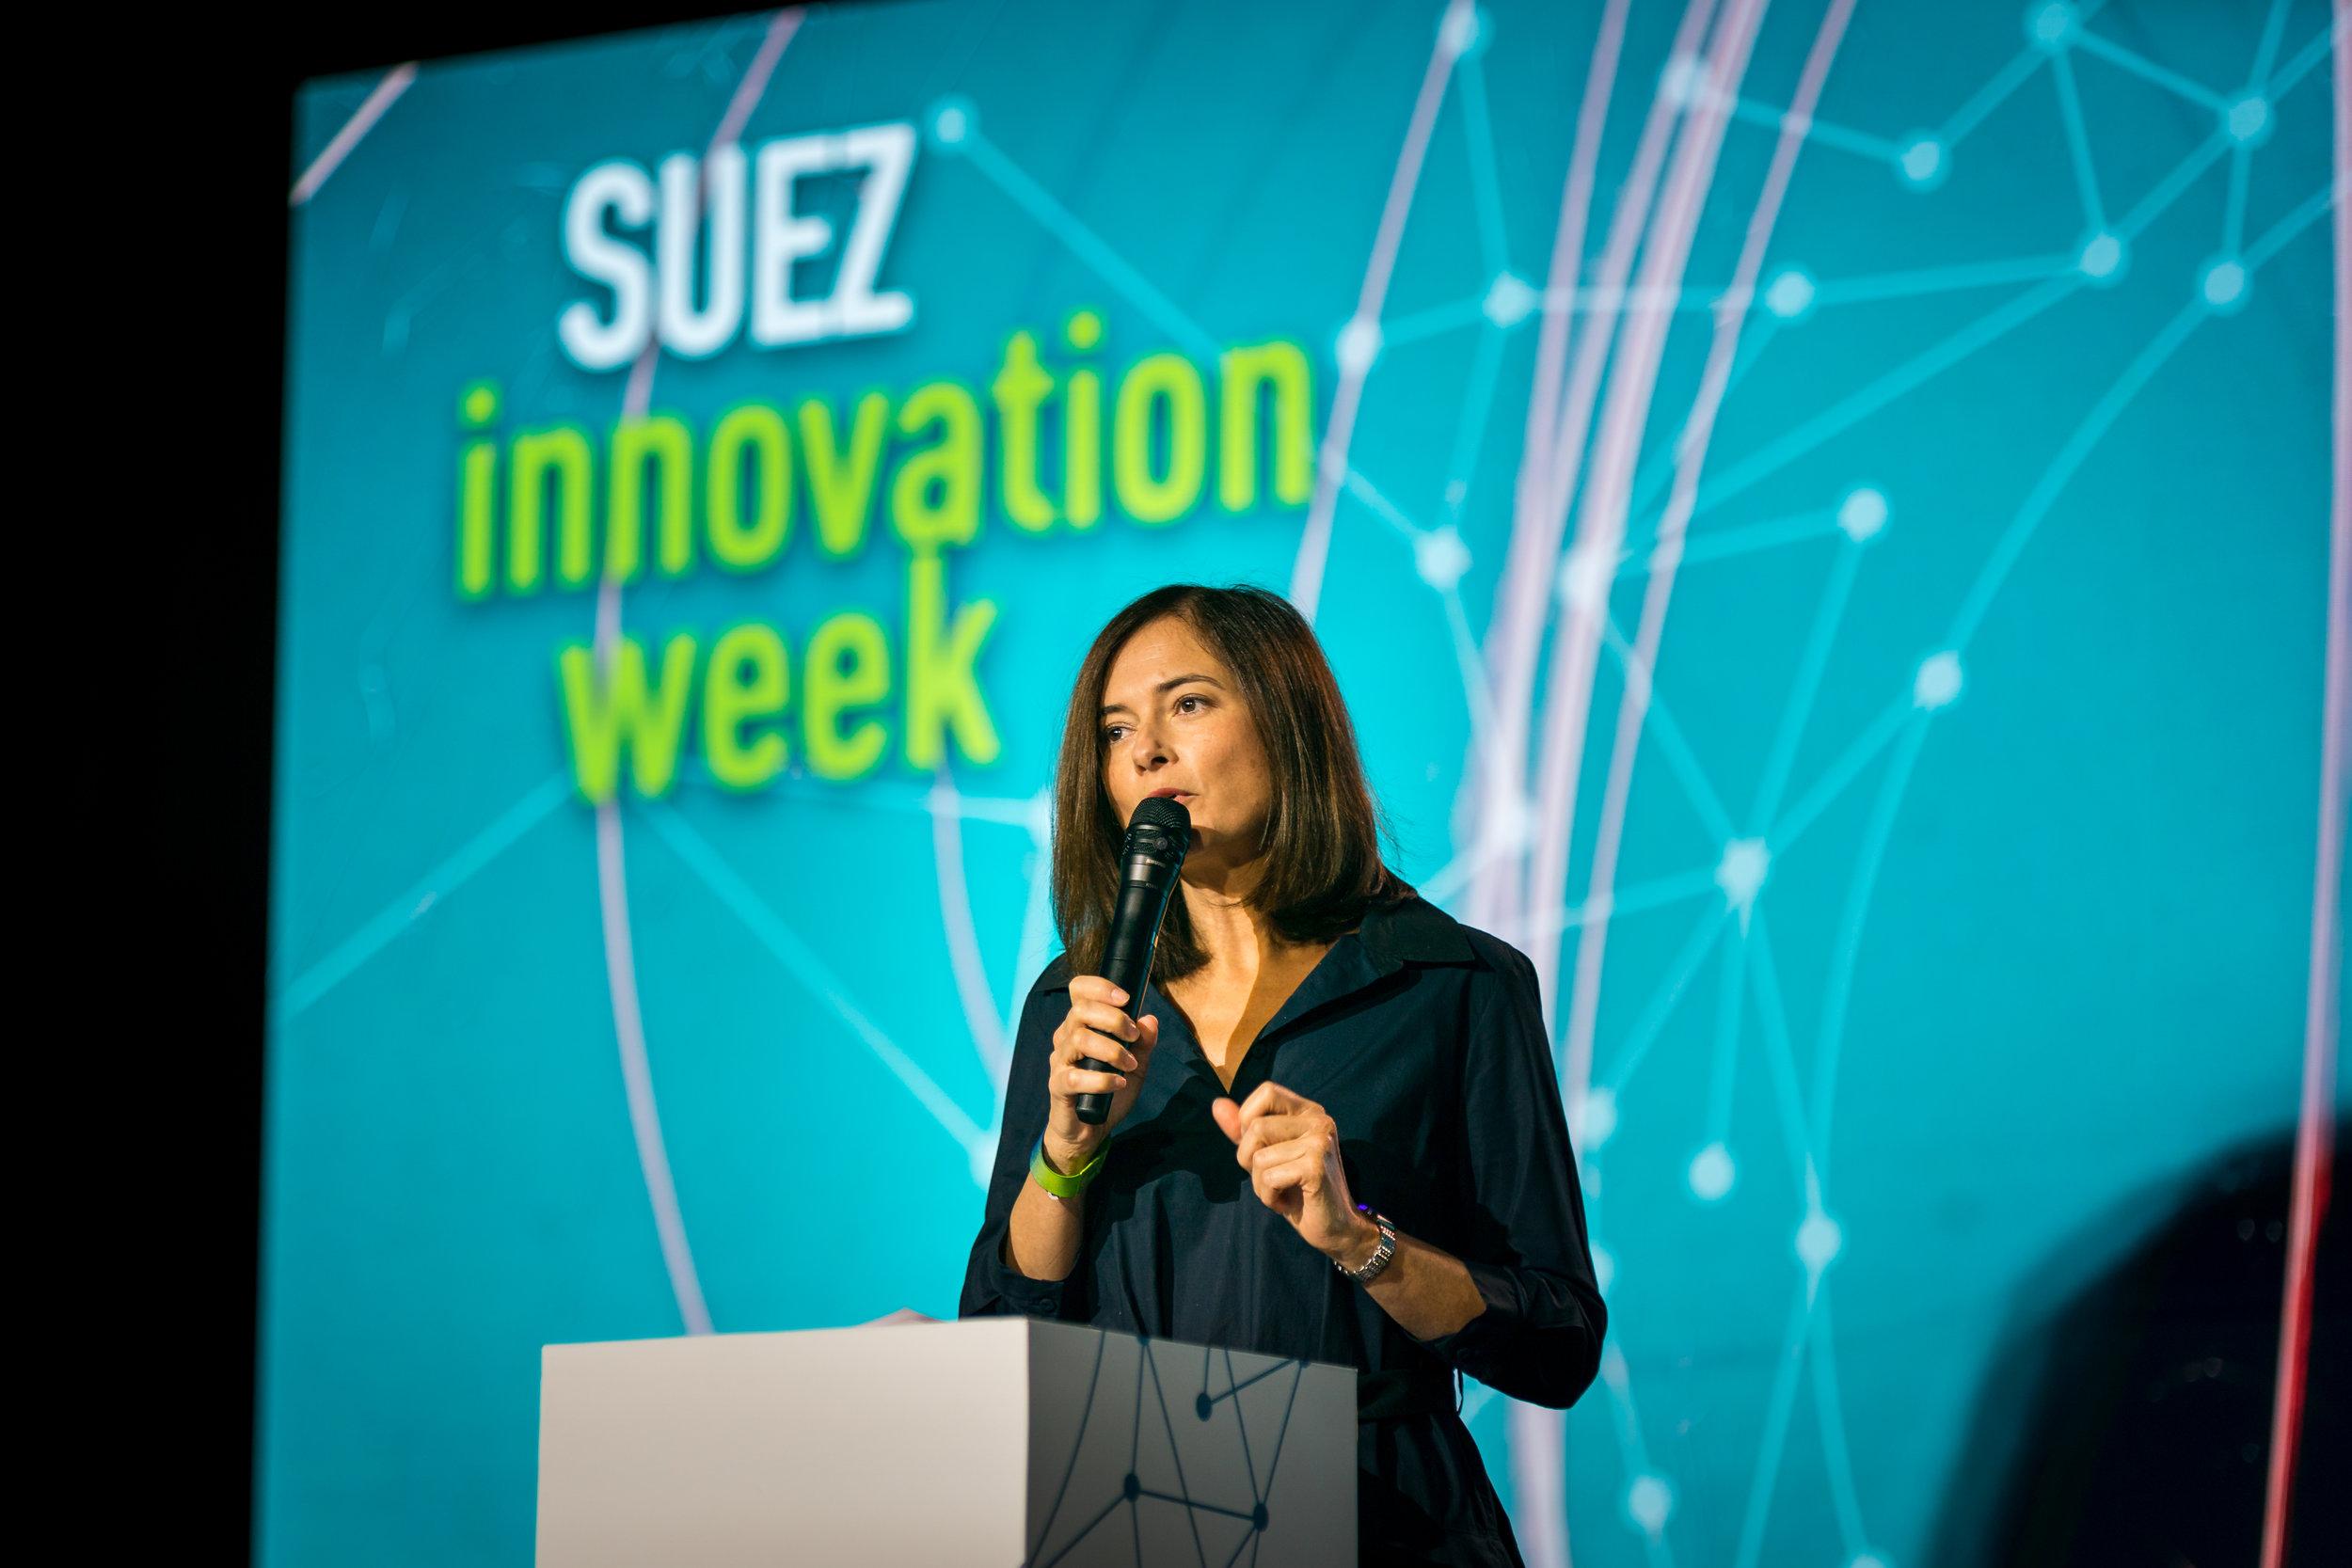 Suez_16-10-18_Florian Leger-255.jpg